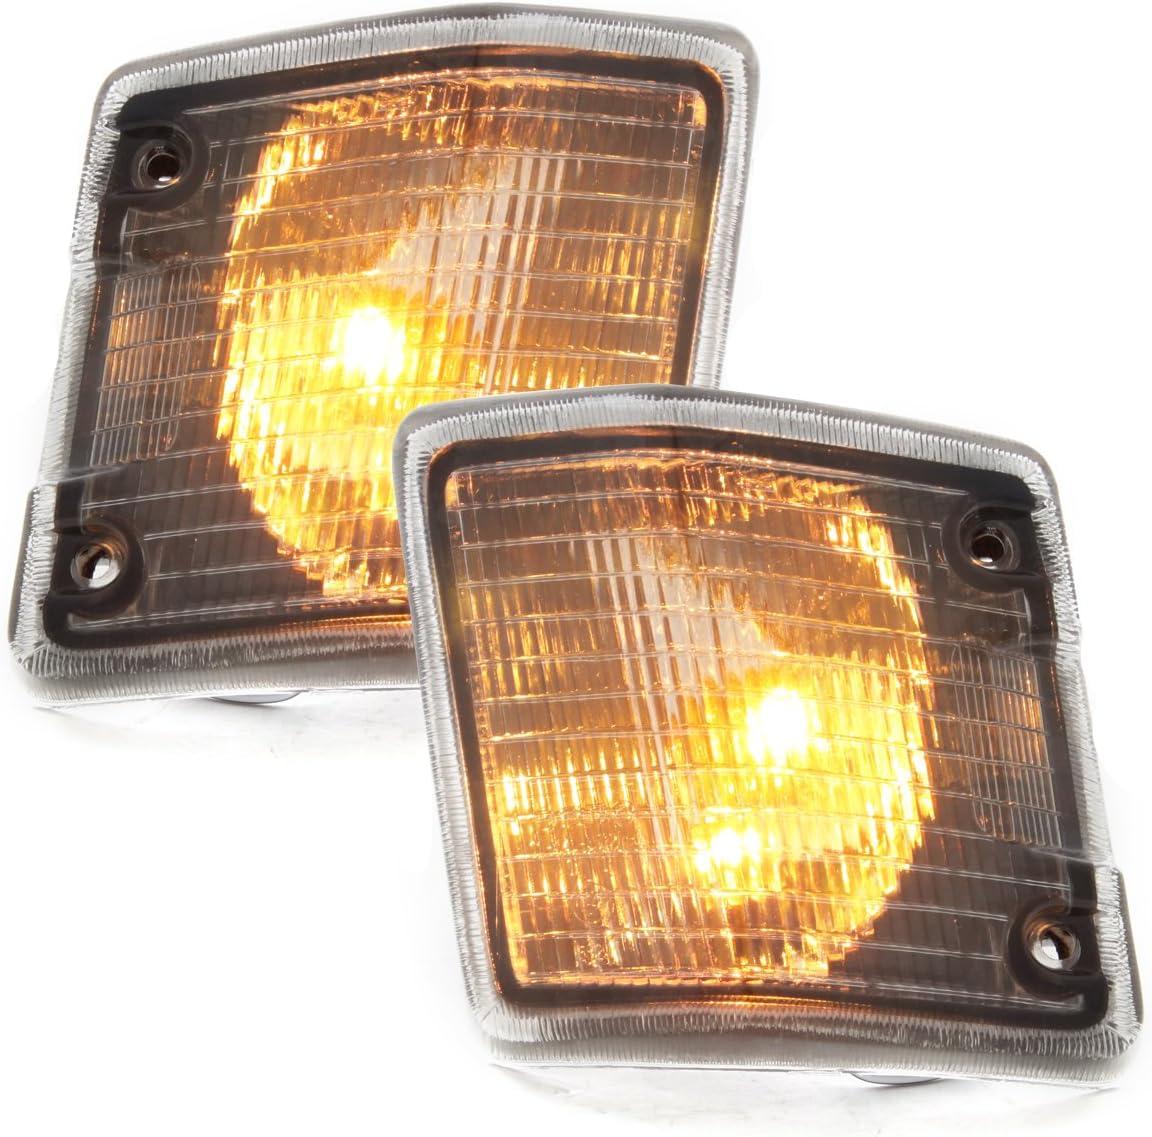 Dectane KGV06DS modelos de 1972 a 1992 Intermitente frontal para  T3 Bus Transr color gris oscuro